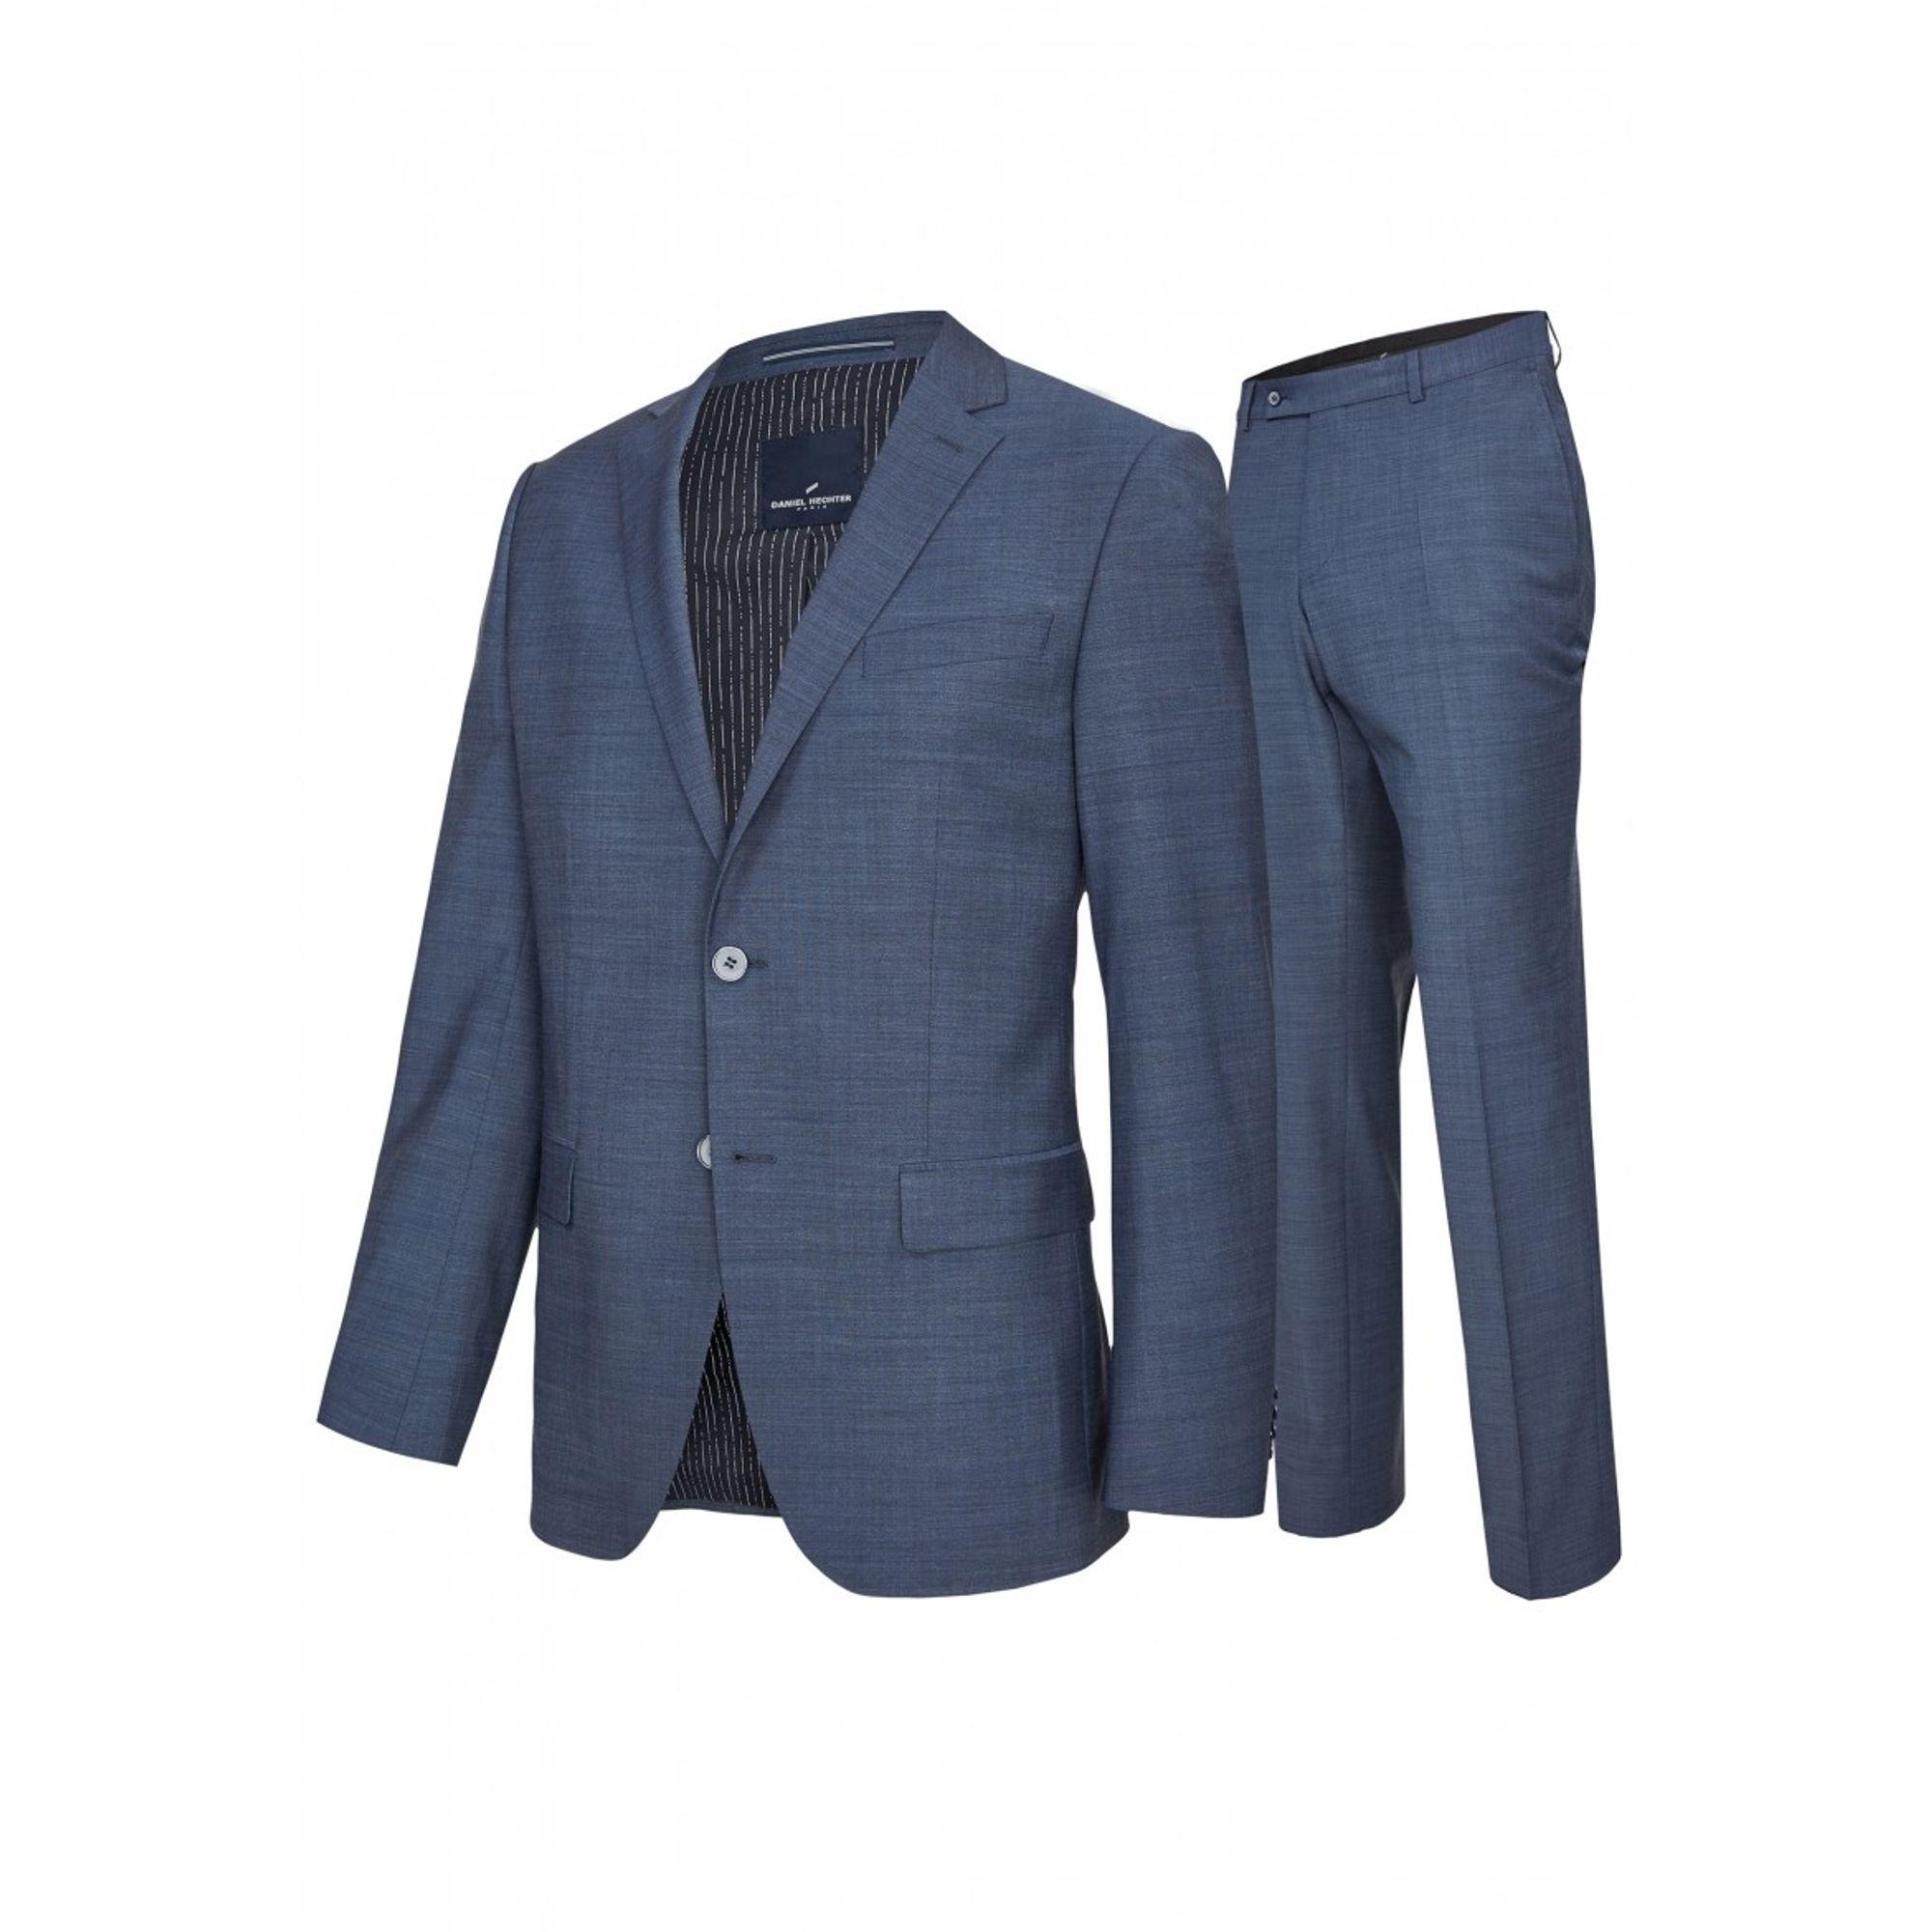 Daniel Hechter Herren Anzugjacke Jacket Modern